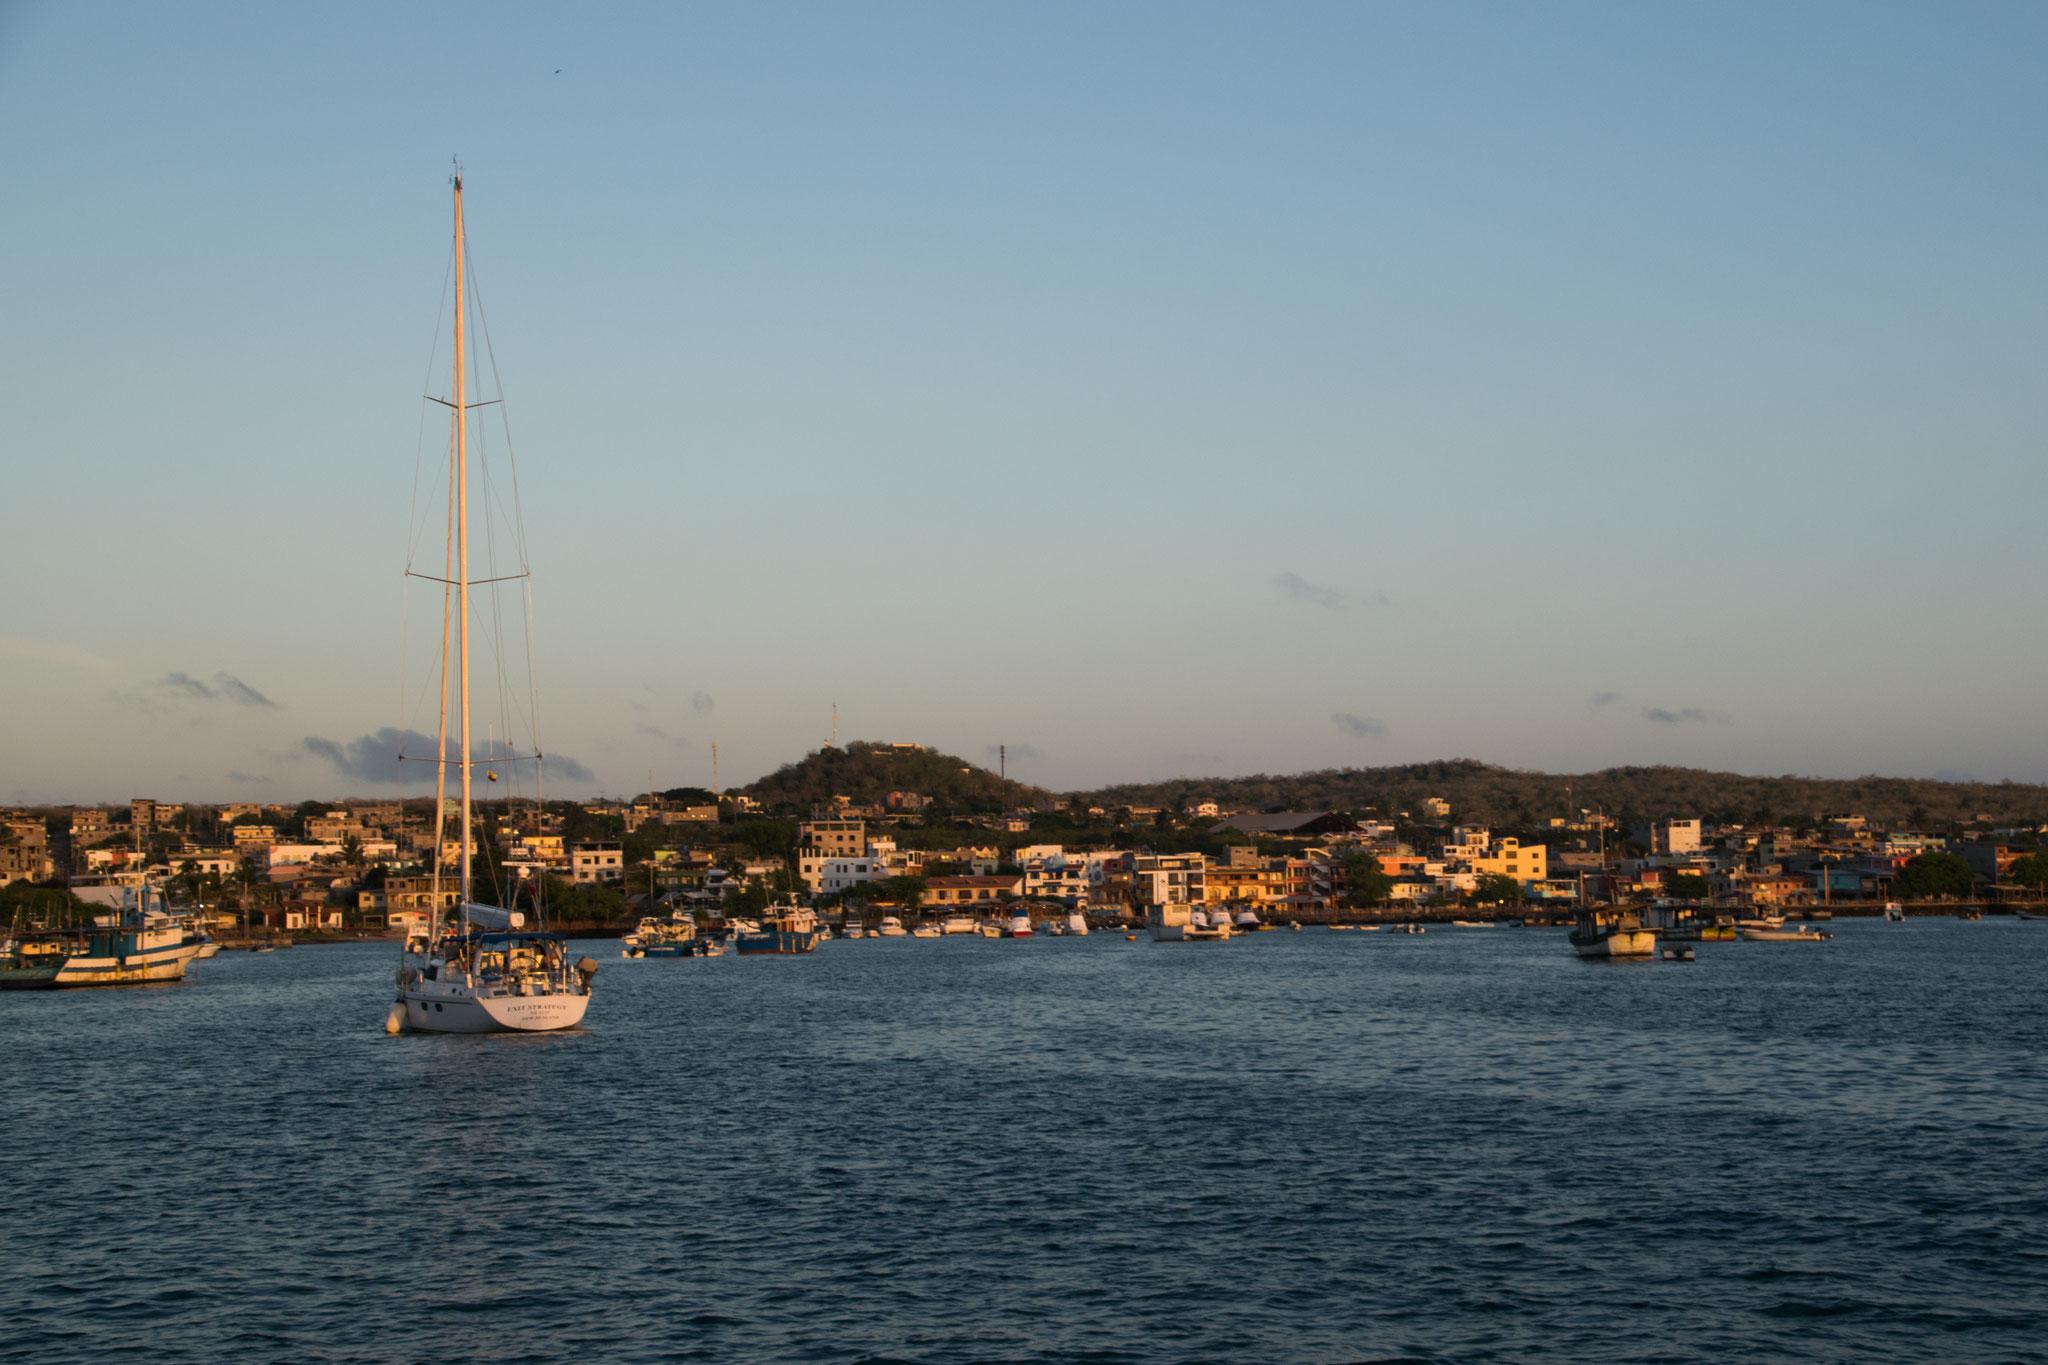 Die Hauptstadt von Galapagos, Puerto Baquerizo Moreno